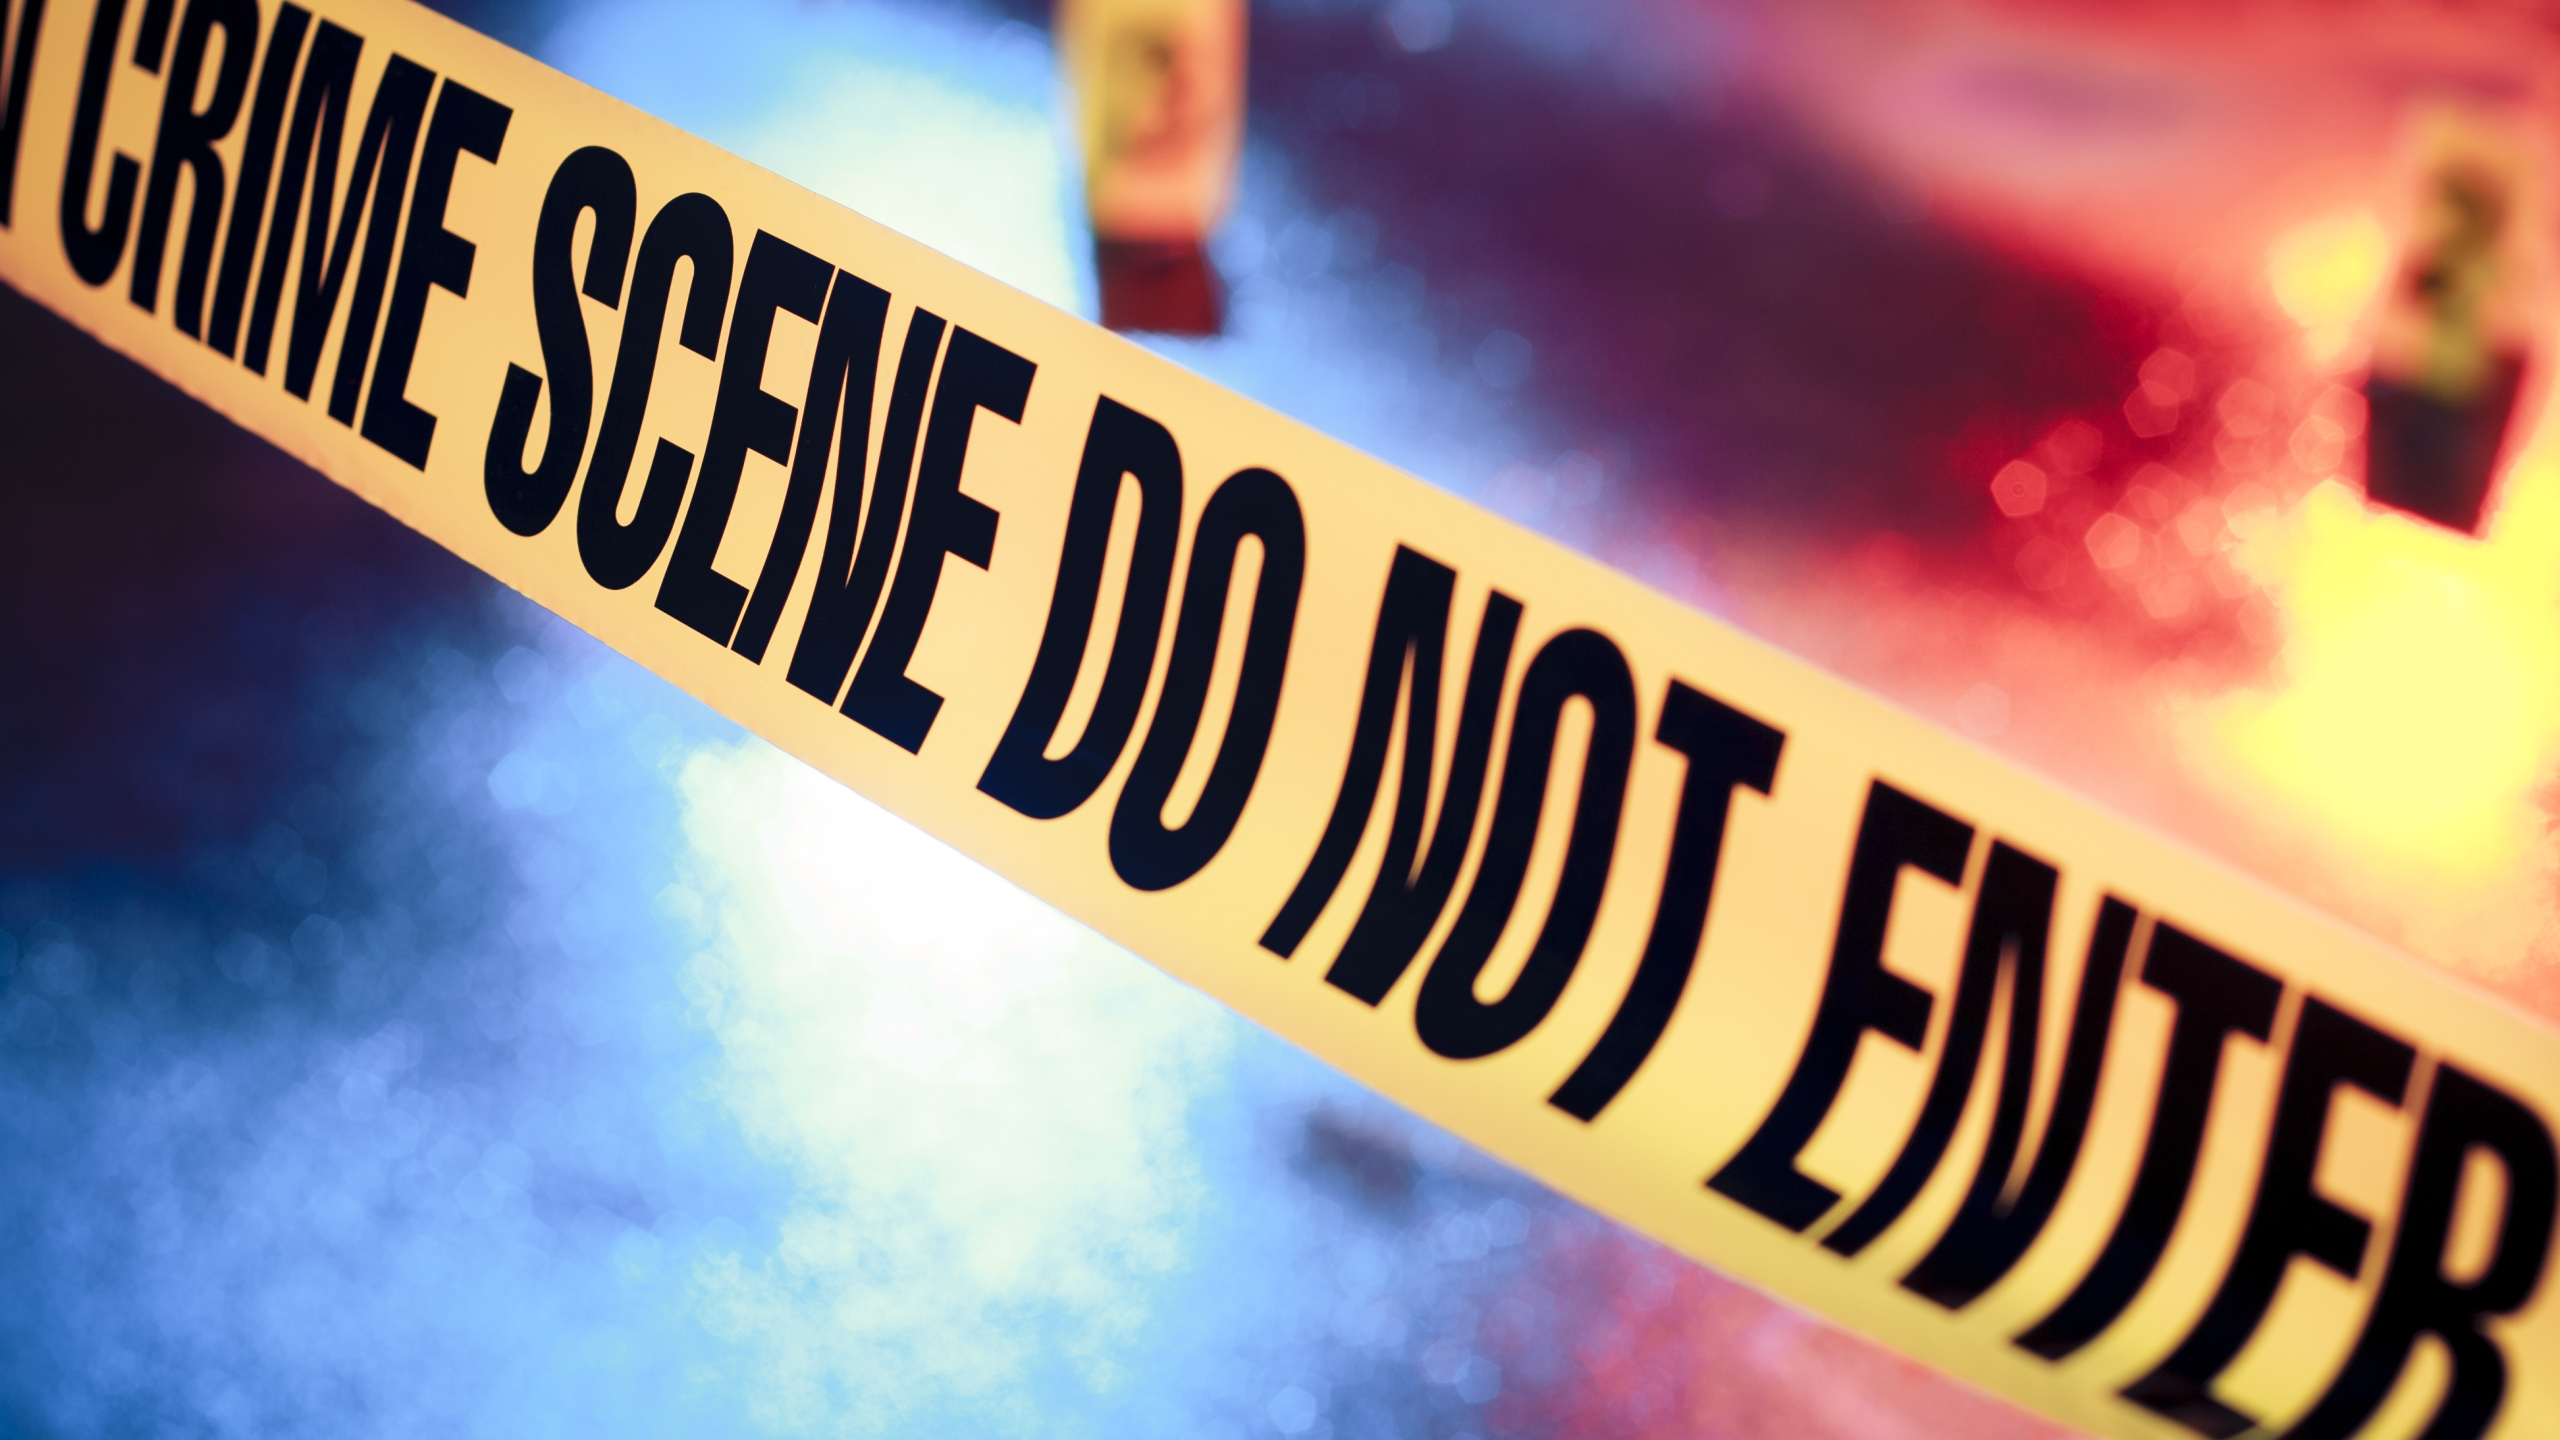 crime scene stock photo 1_1519129493322.jpg.jpg